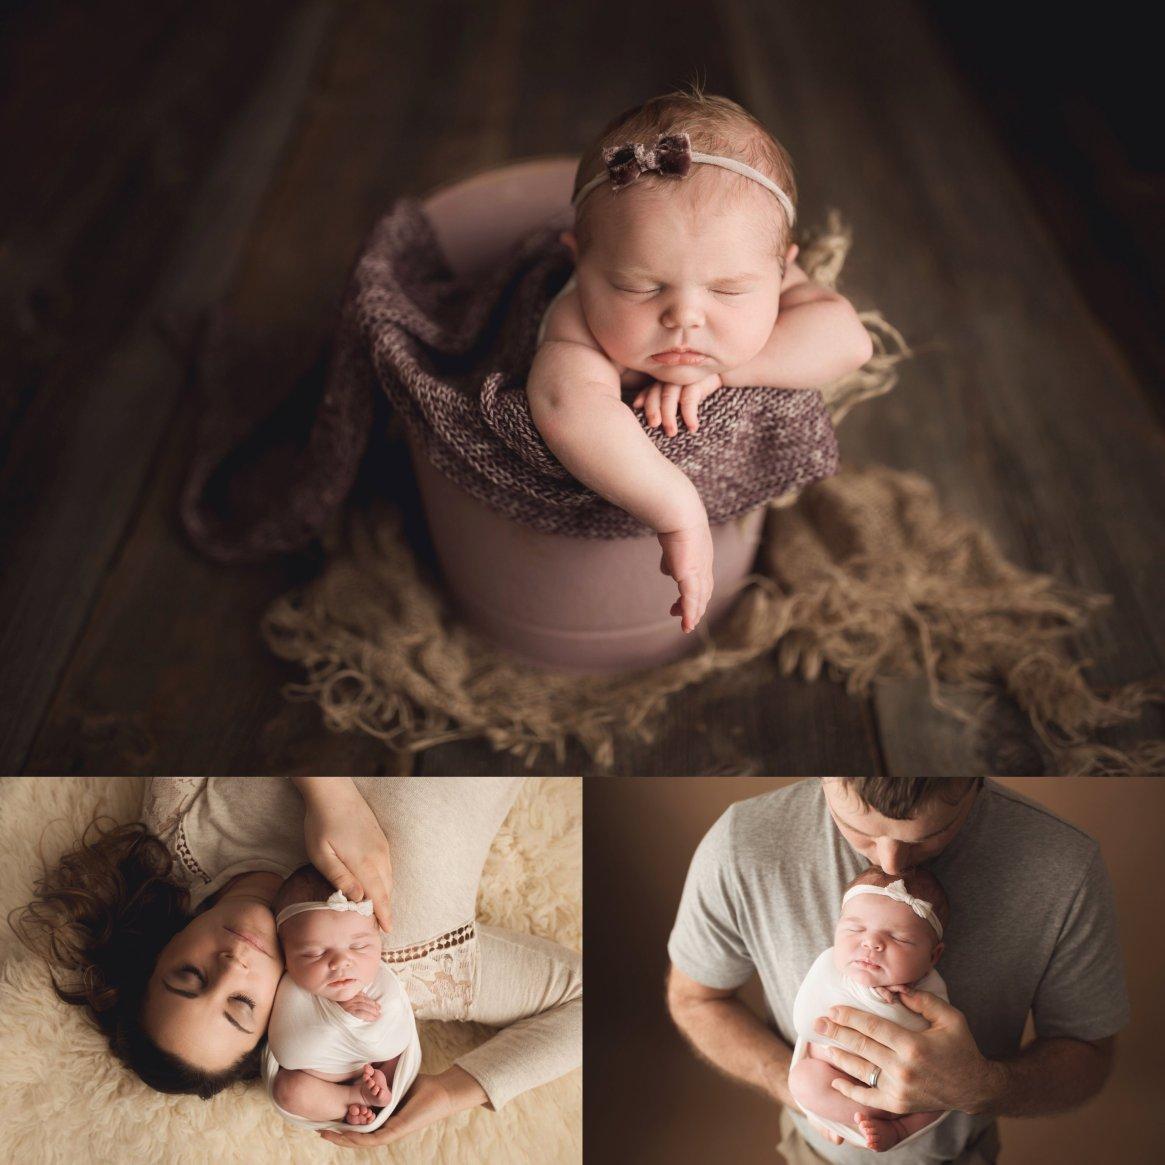 newborn photography sessions